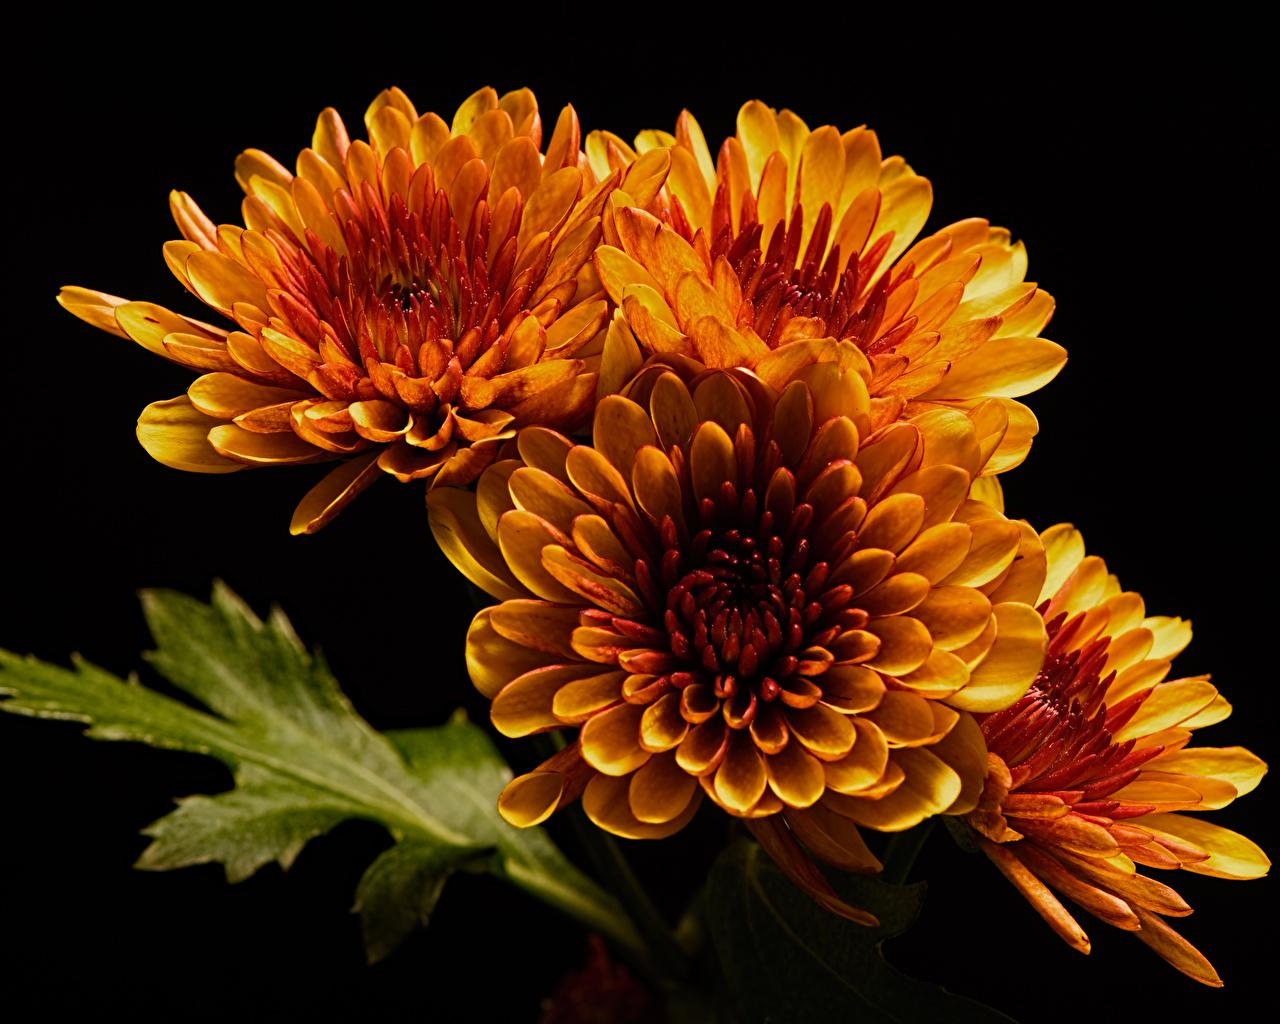 Wallpaper Orange flower Chrysanthemums Closeup Black background Mums Flowers Chrysanths